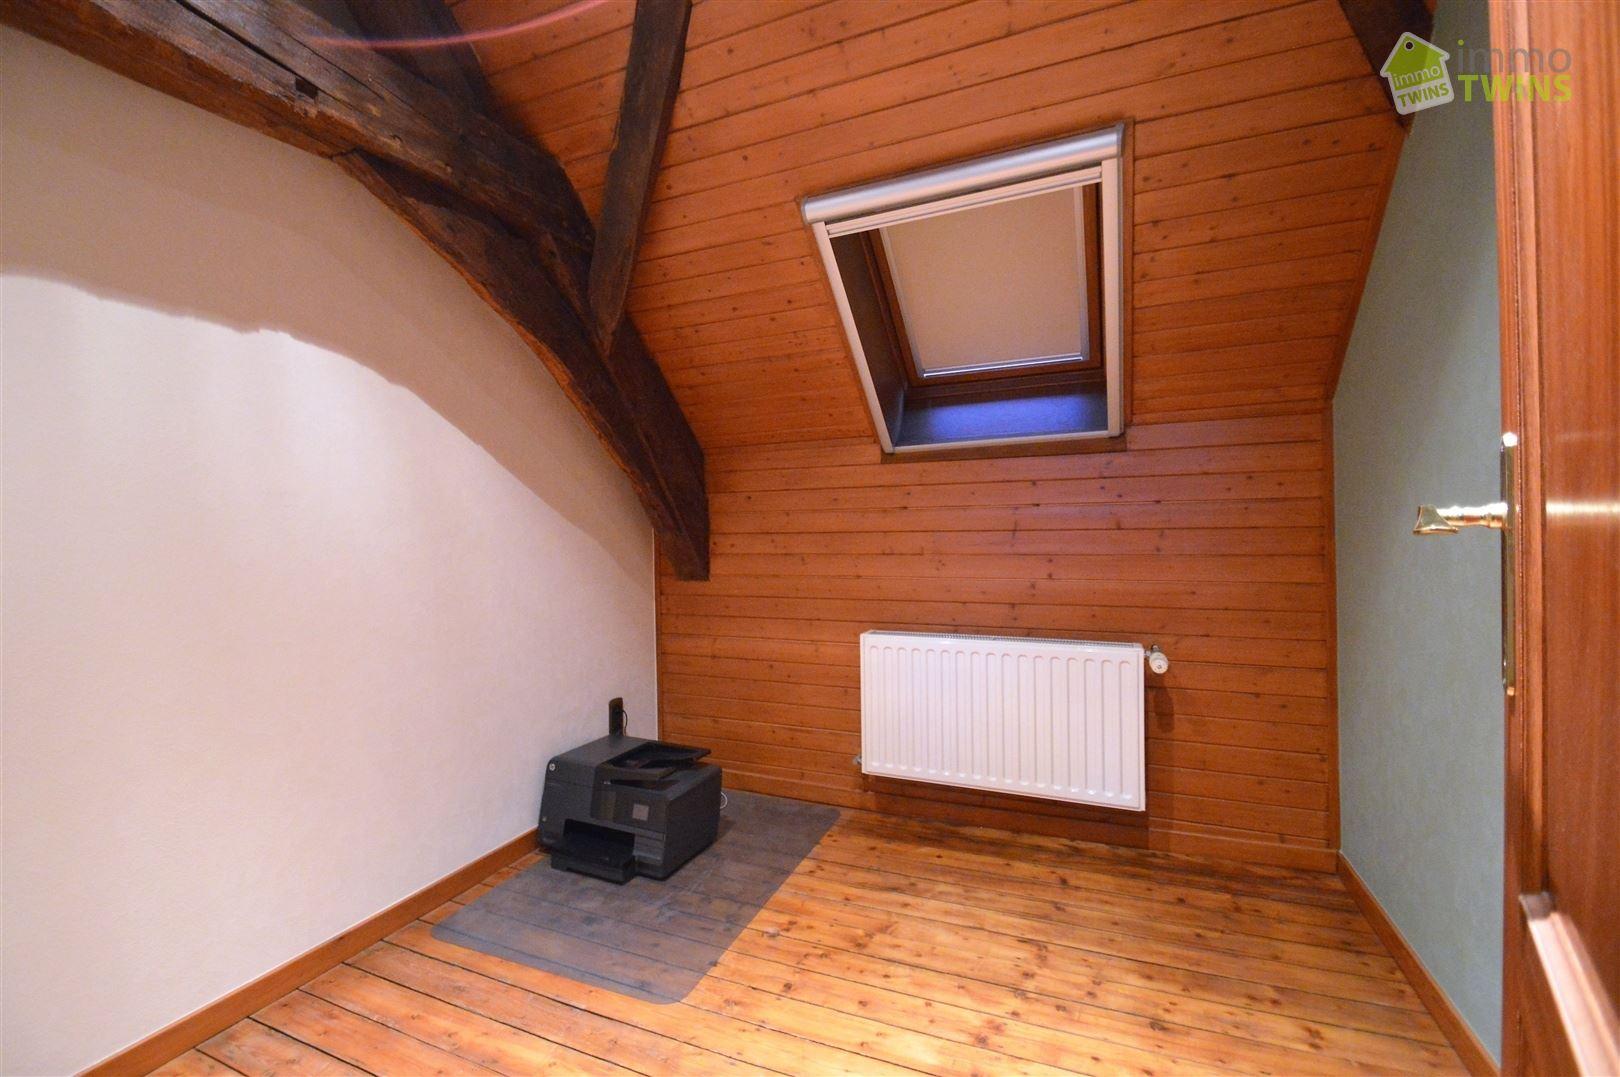 Foto 21 : Duplex/Penthouse te 2890 SINT-AMANDS (België) - Prijs € 429.000